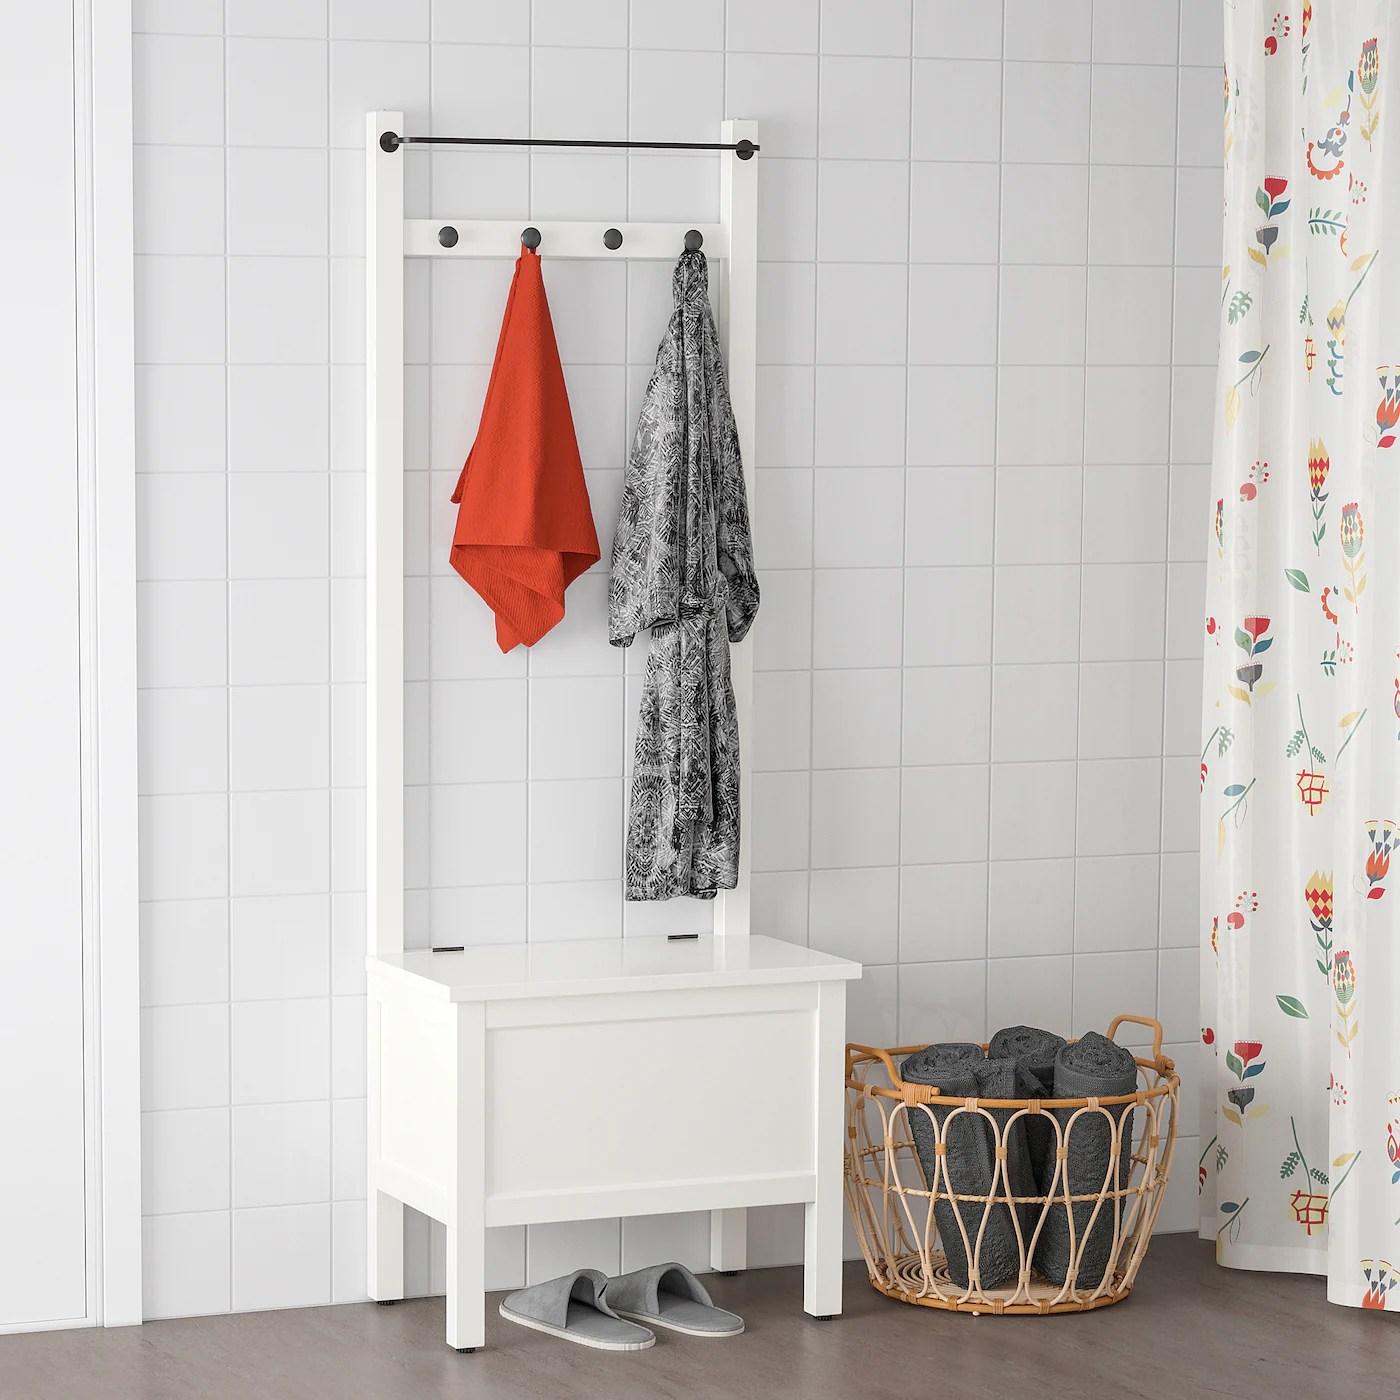 Hemnes Banc Rgt Barre Pte Serv 4 Crochets Blanc 64x37x173cm Site Web Officiel Ikea